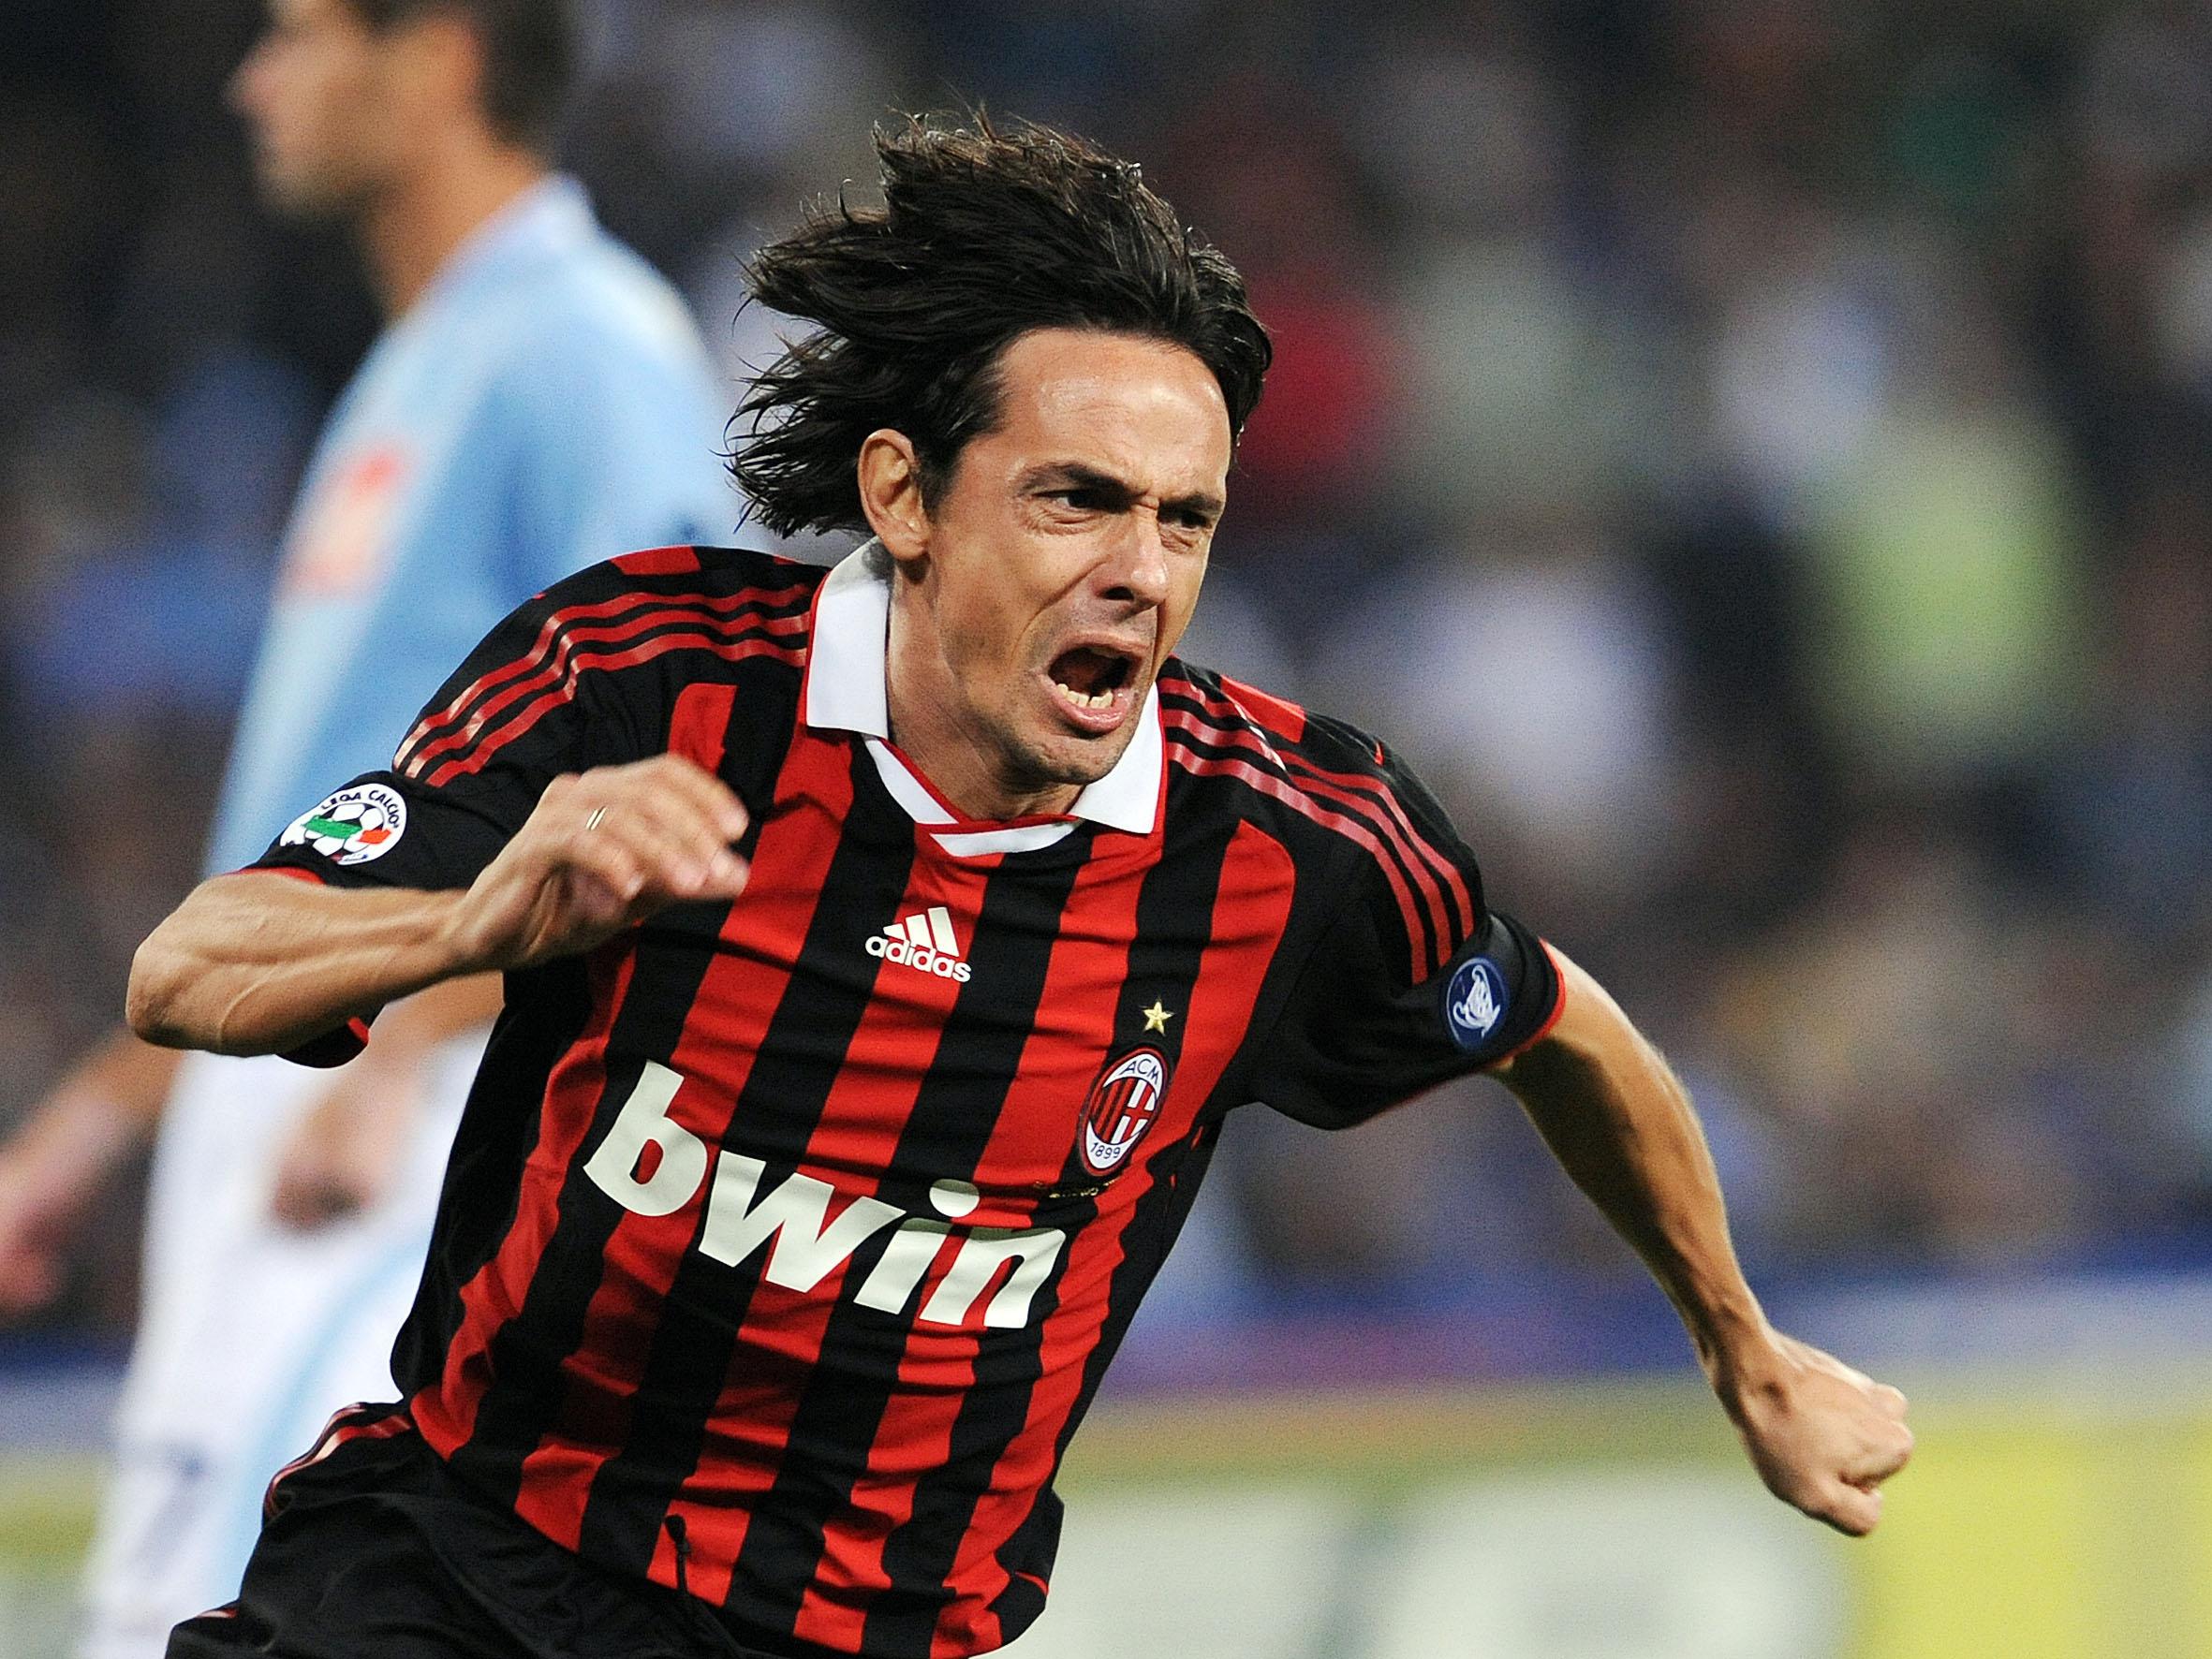 Gary Neville likens Manolo Gabbiadini to AC Milan legend Filippo Inzaghi